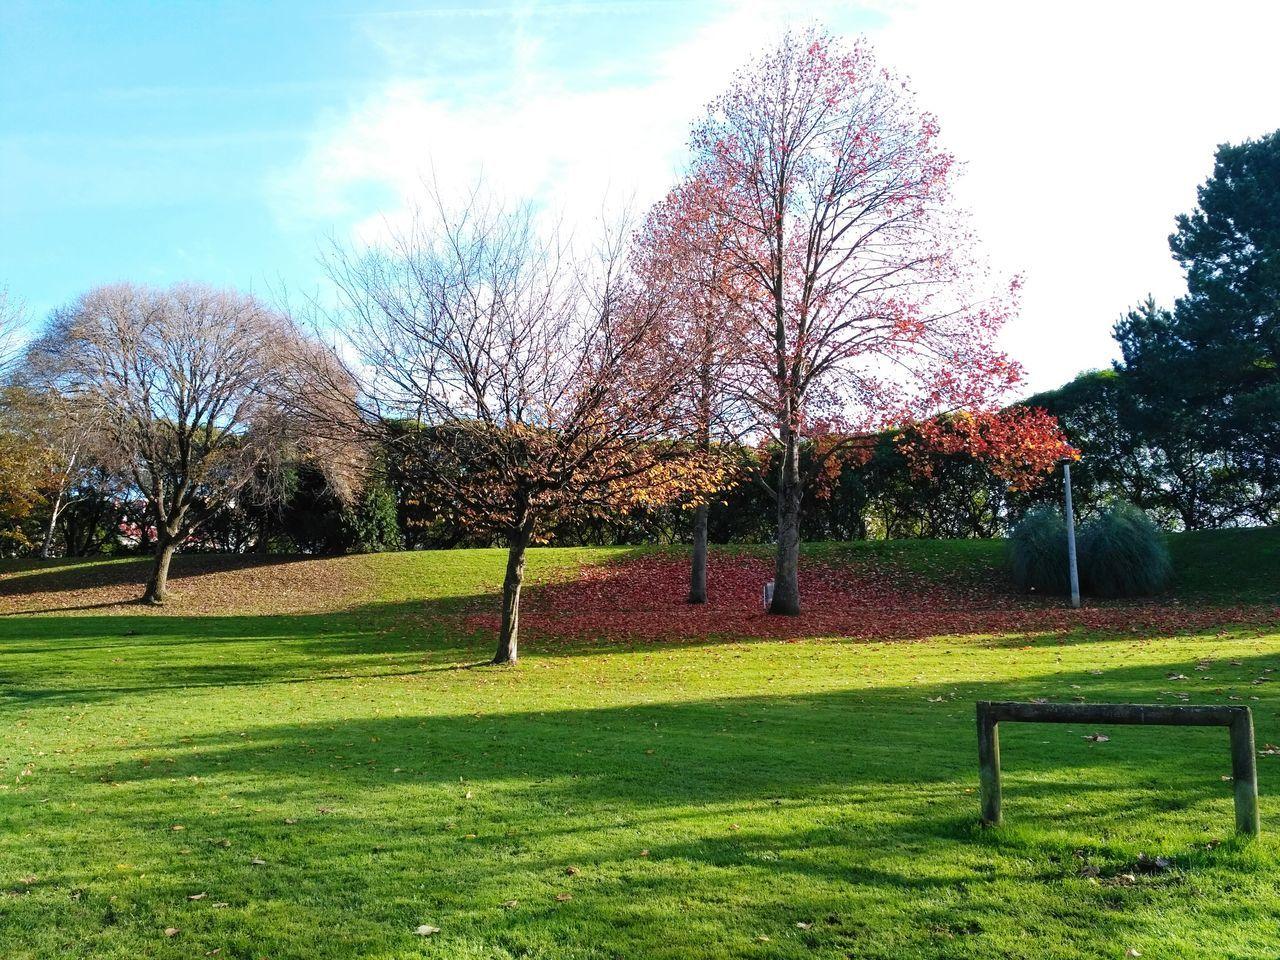 Nature Autumn Park Trees Autumn Colors Autumn Leaves Autumn🍁🍁🍁 Gijón